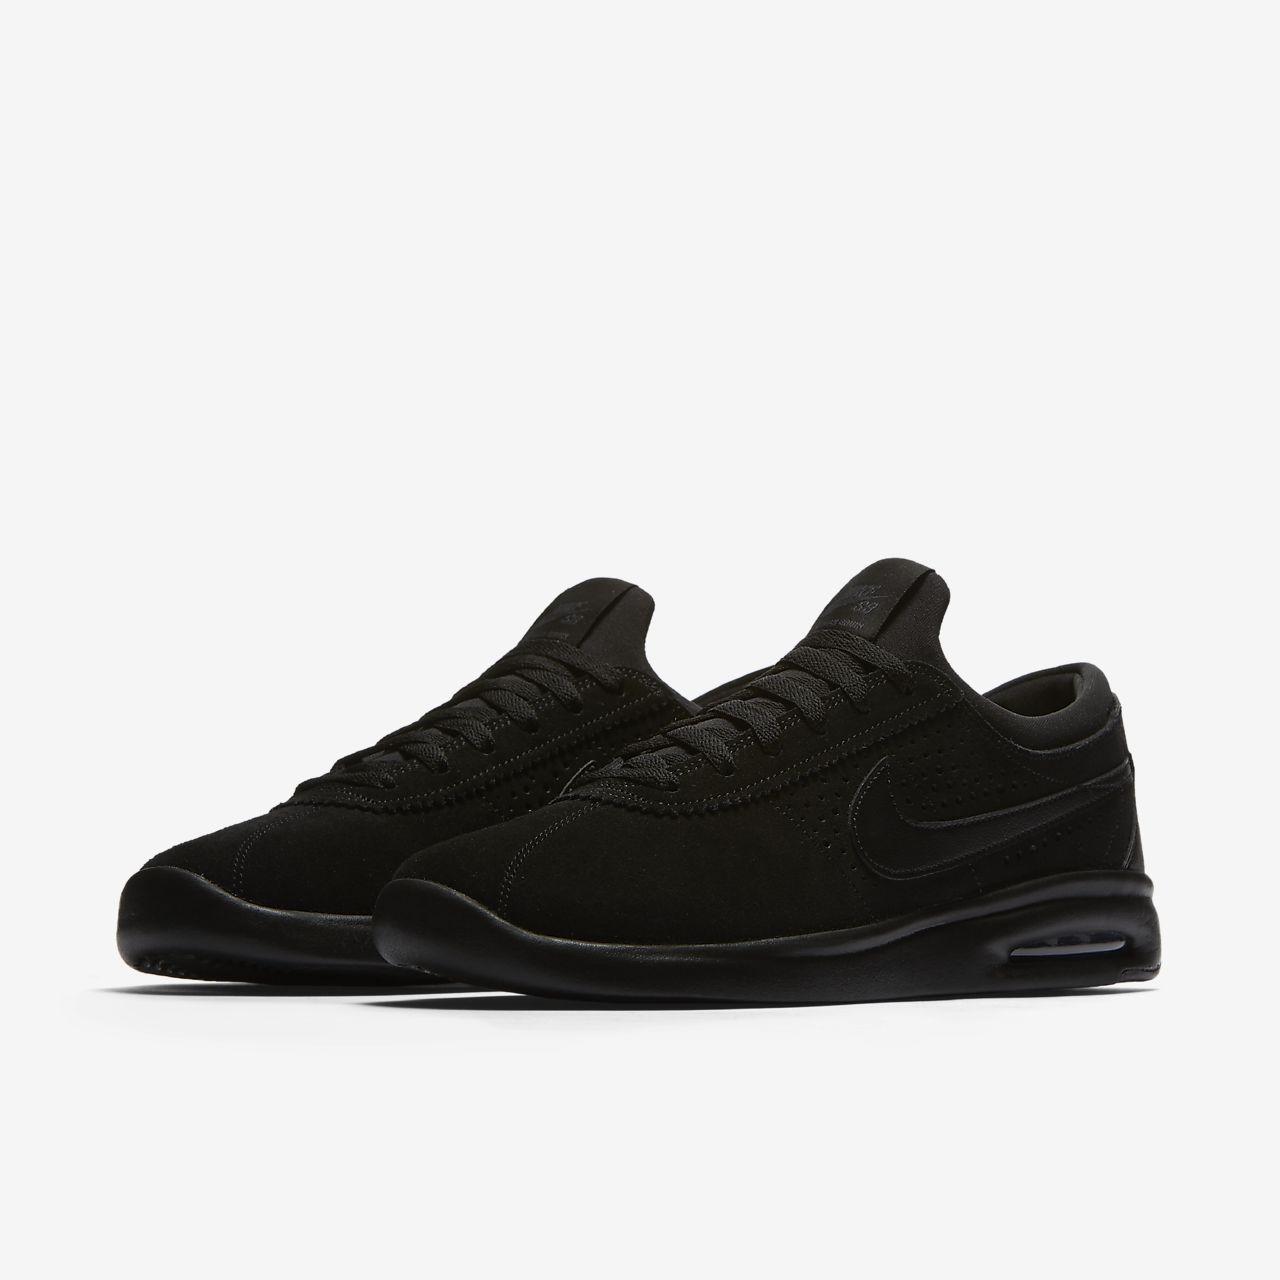 Noir Nike Collection De Chaussures 40 Hommes AriiX1